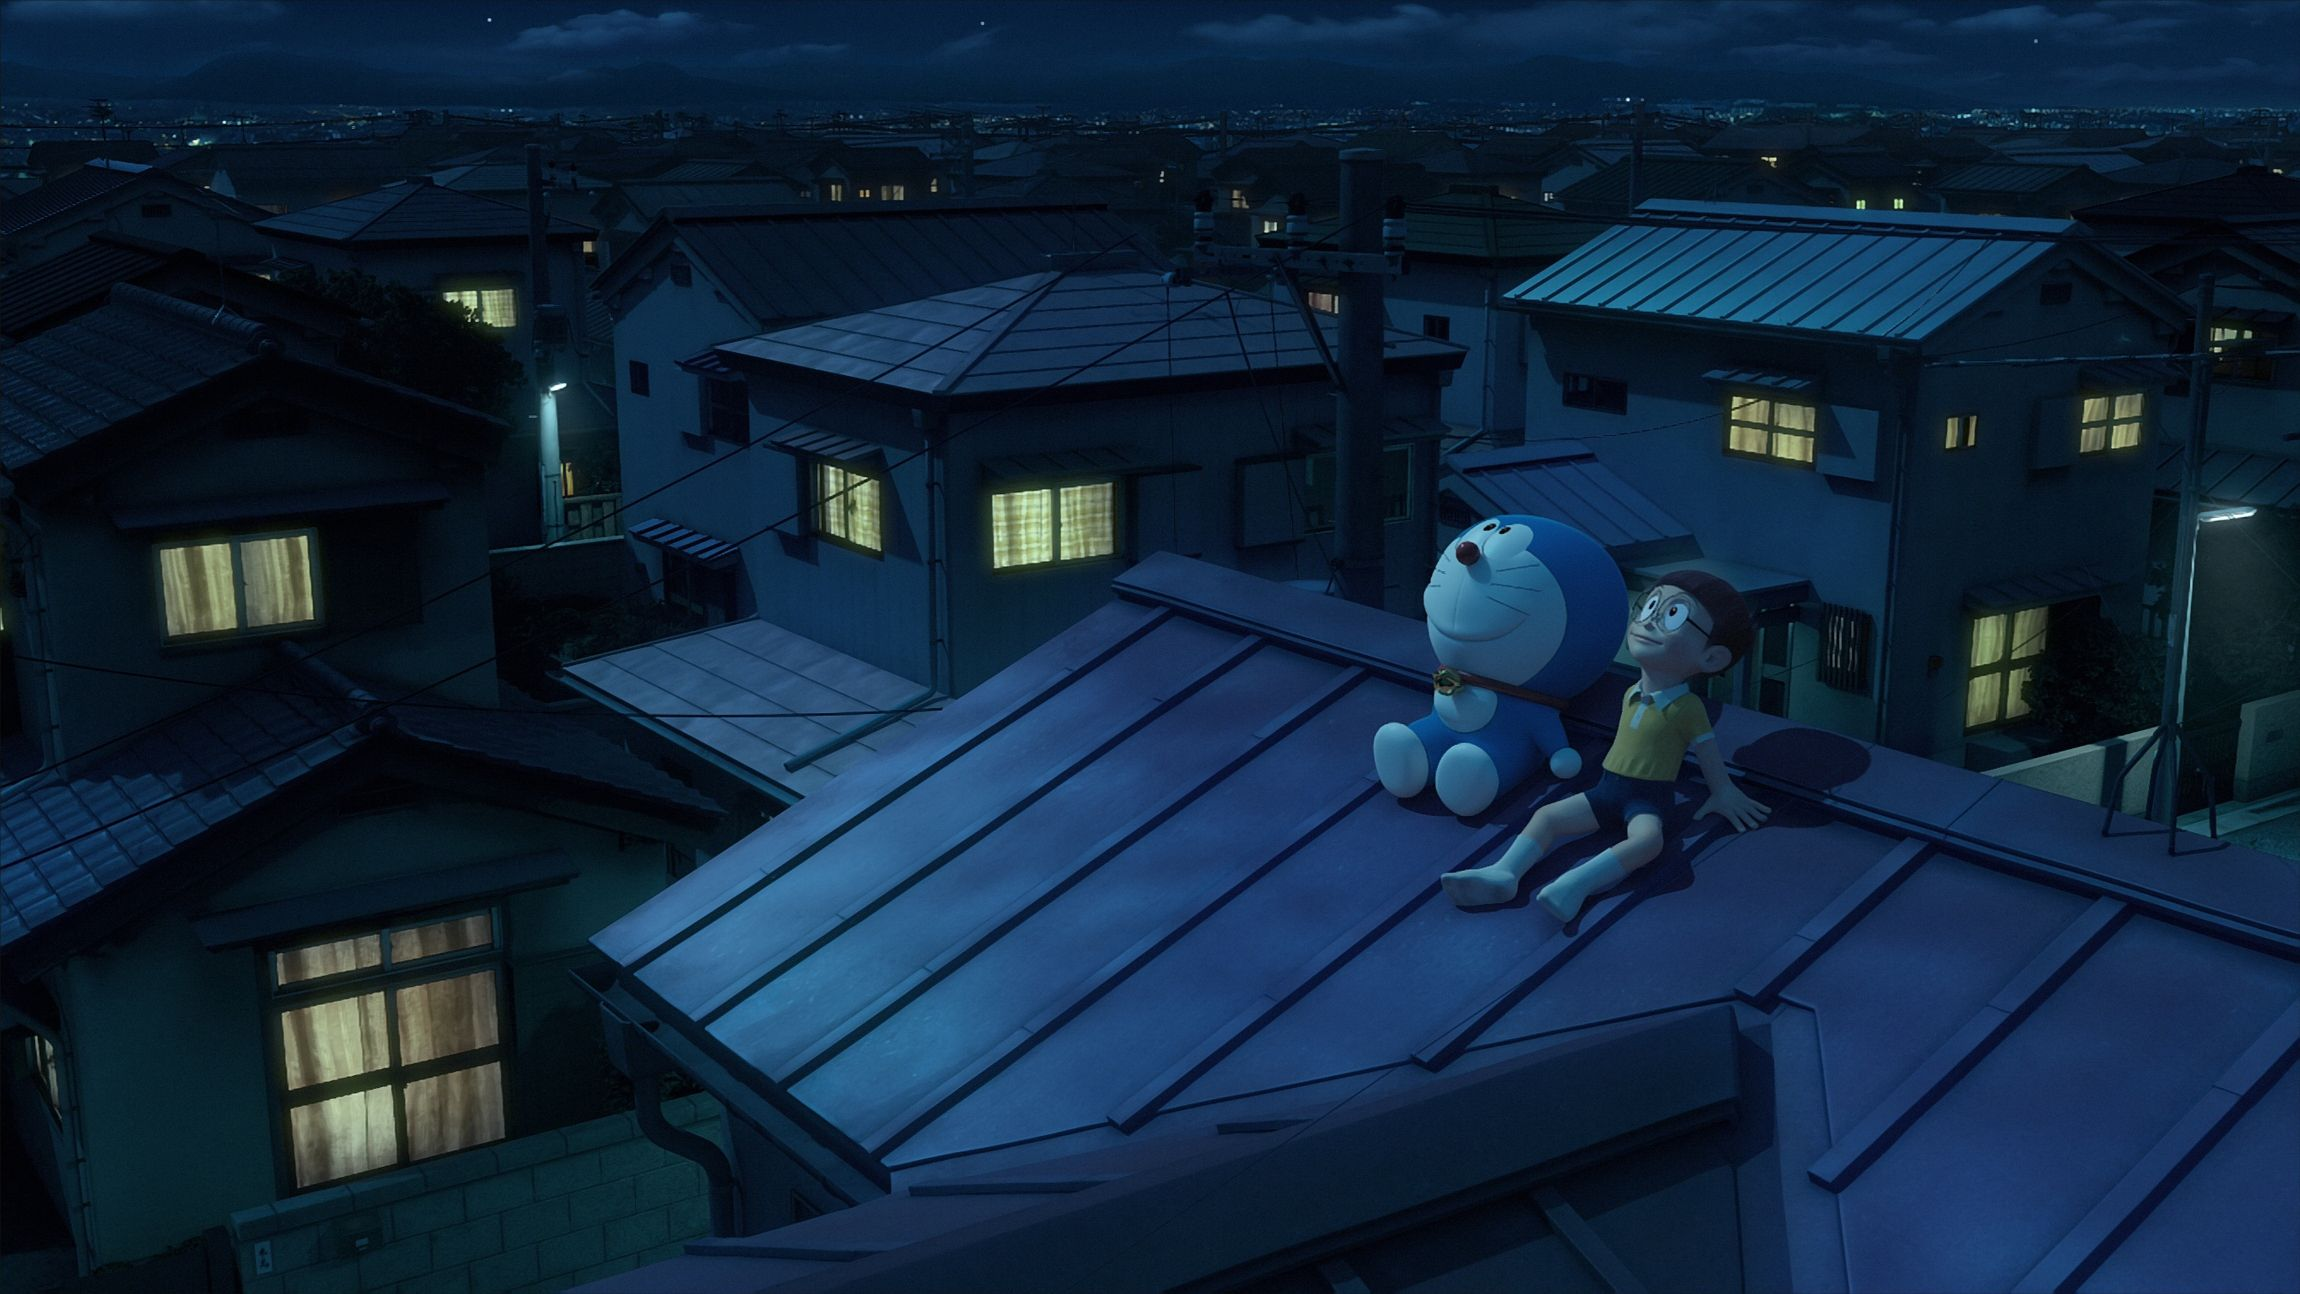 Nobita 3d Wallpaper Stand By Me Doraemon เผยชื่อไทยทางการ ตัวอย่างฉบับไทยจะ